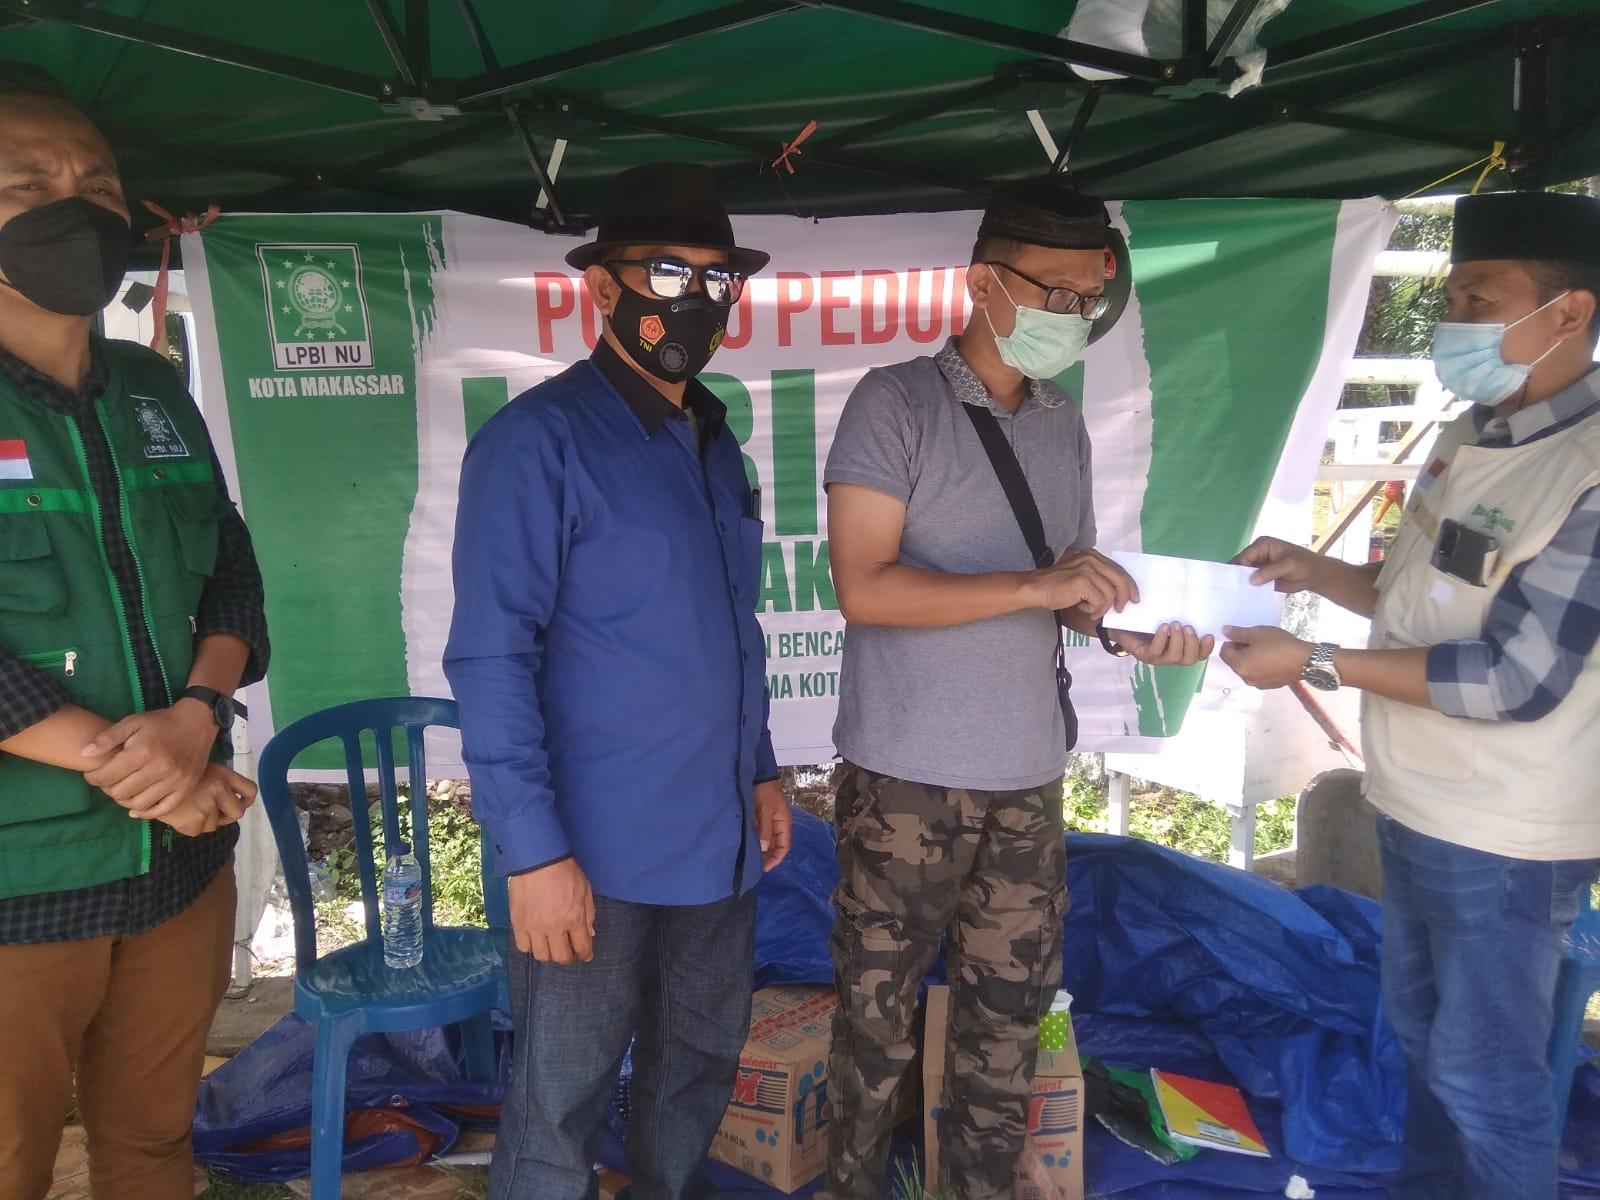 Penyerahan bantuan korban kebakaran di Sudiang Makassar, Rabu 8 September 2021. (Ist)